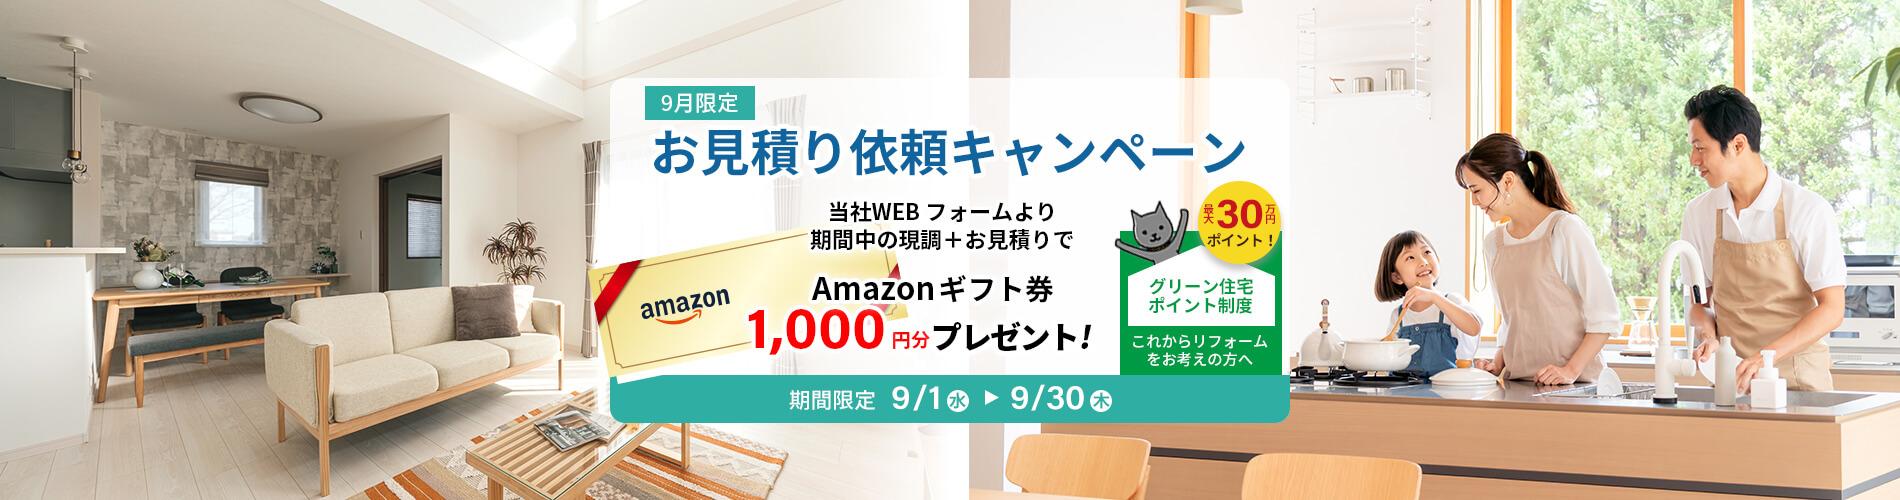 https://www.shikishima-j.co.jp/app-def/S-102/corporate/wp-content/uploads/2021/08/c_slider_pc-1.jpg